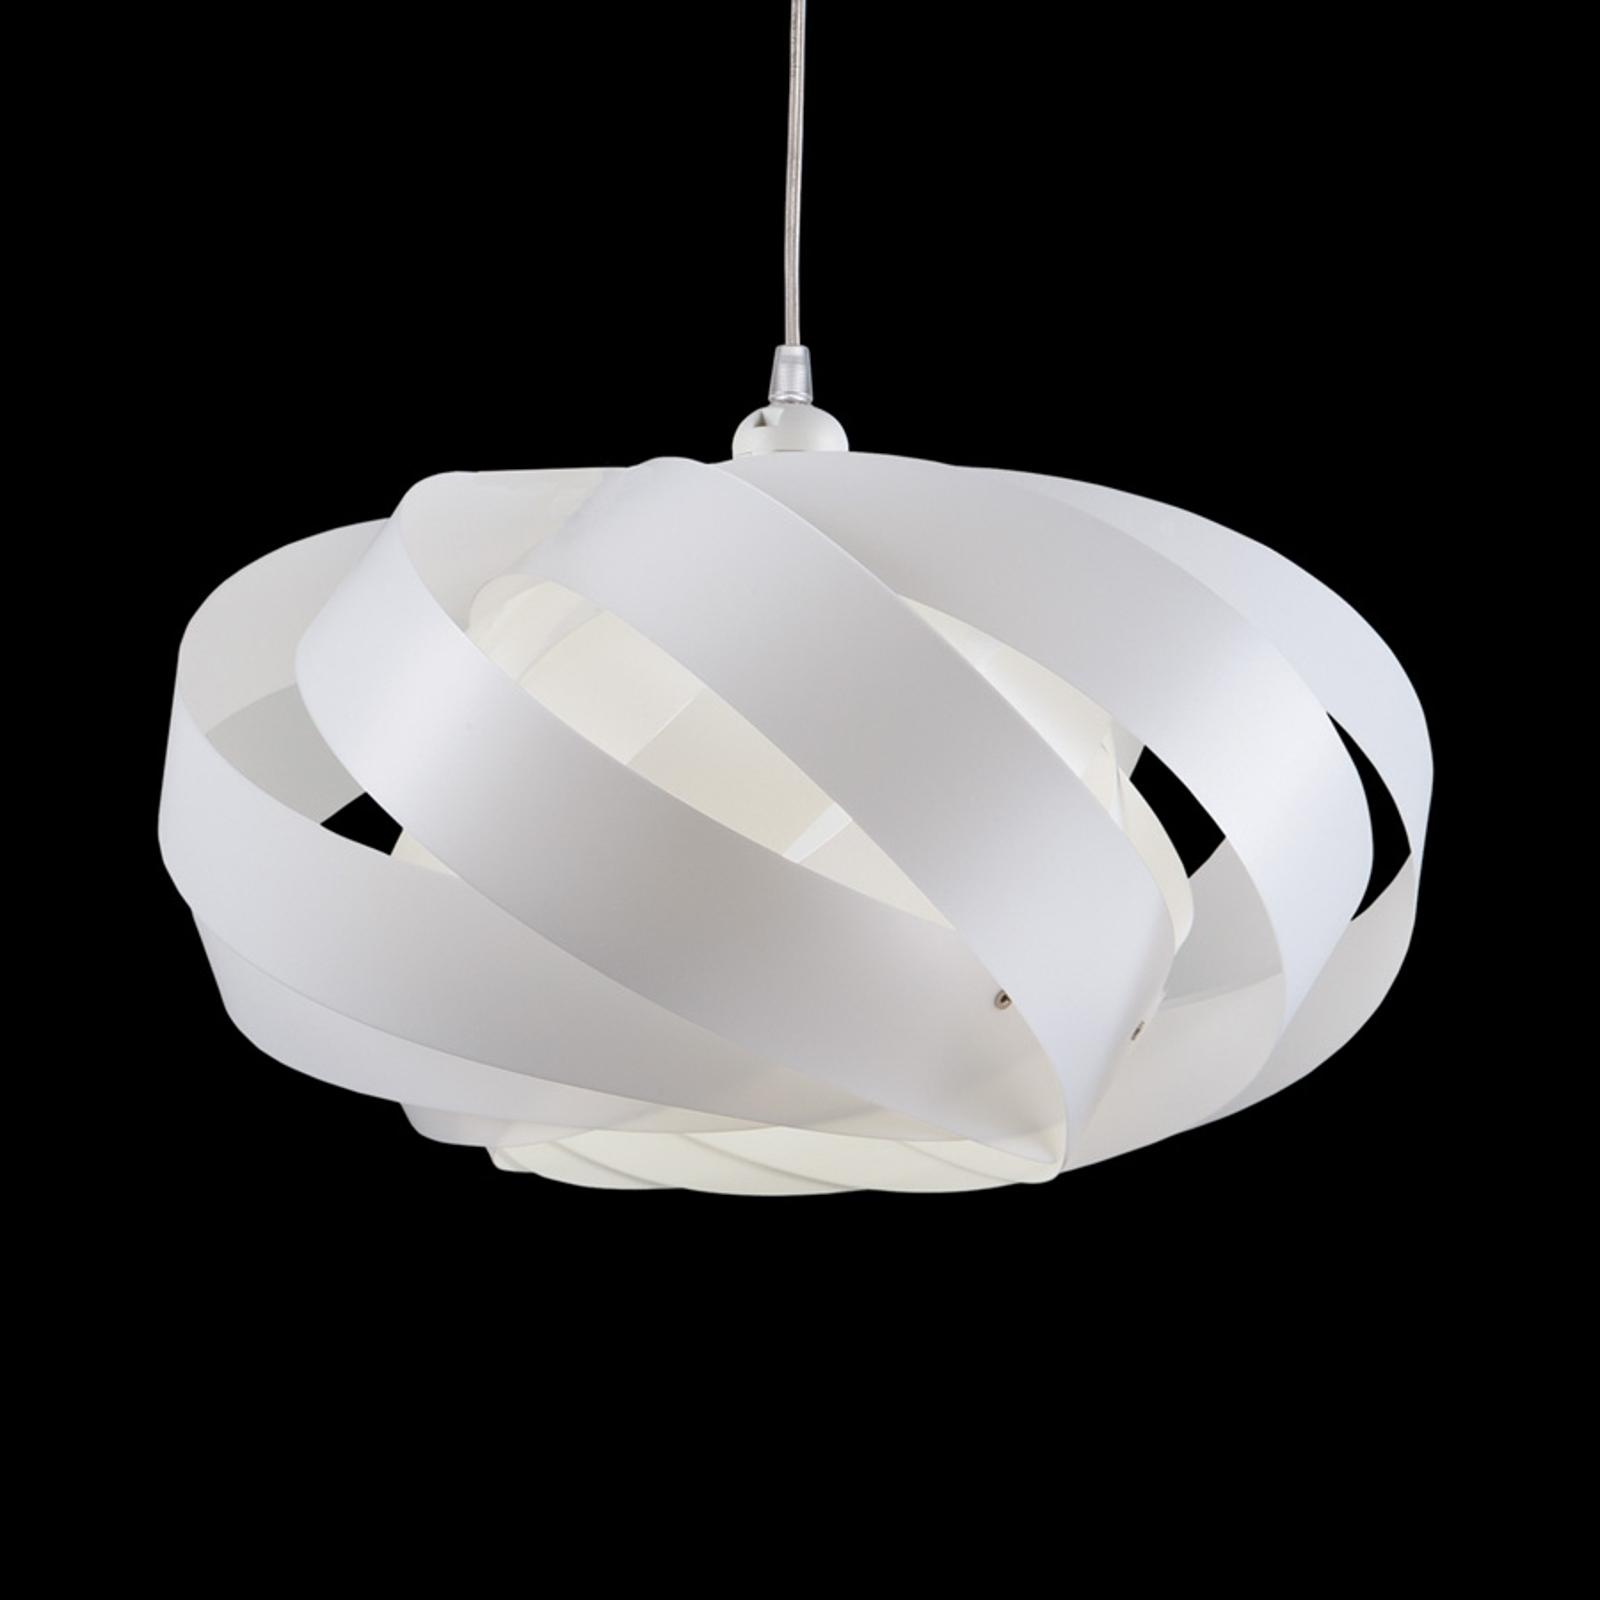 Striped hanging light Mini Nest, white_1056034_1